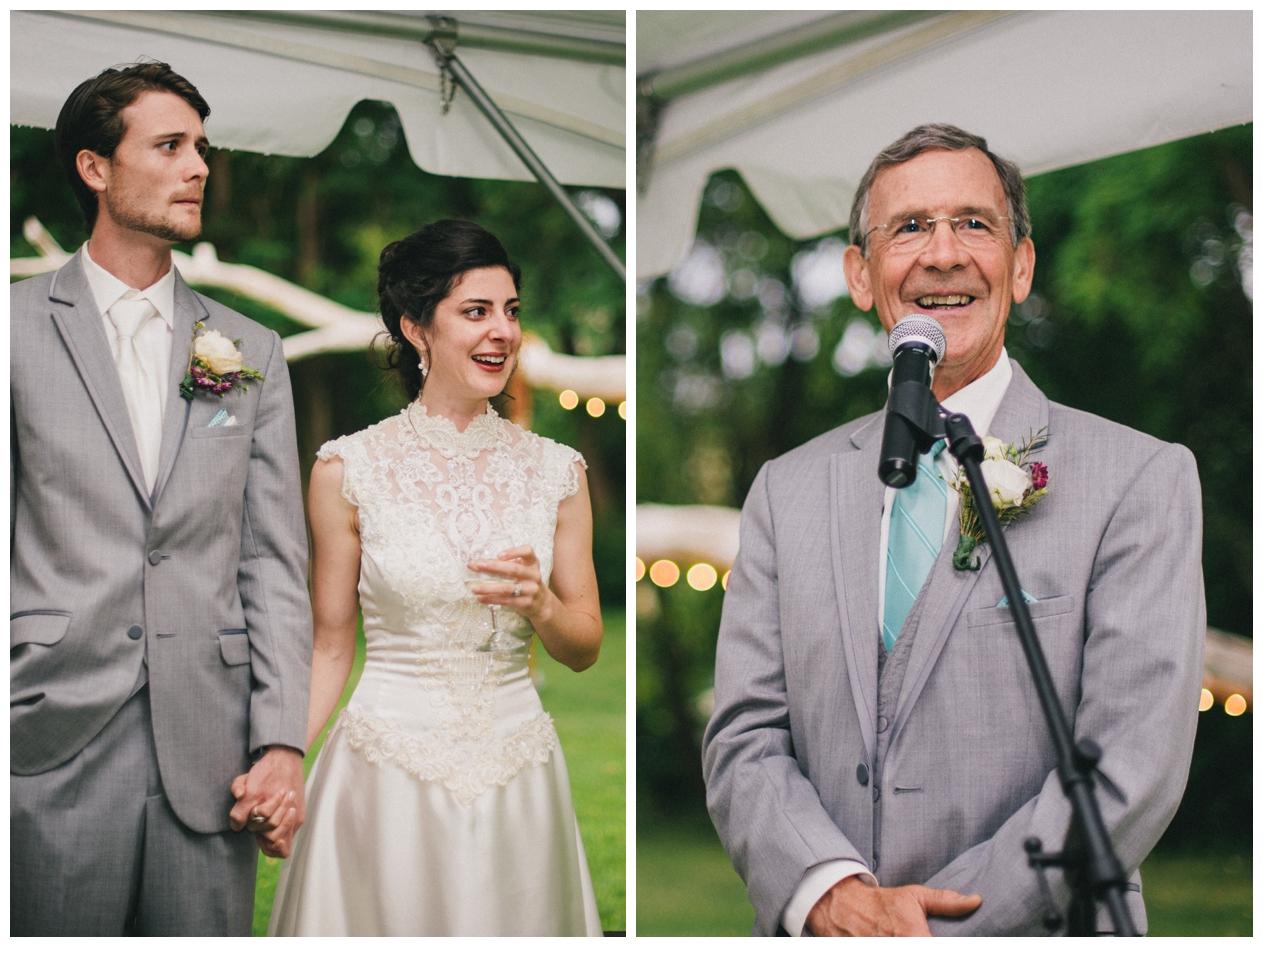 097-AmandaKoppImages-Colorado-Farm-Wedding-Photo.jpg